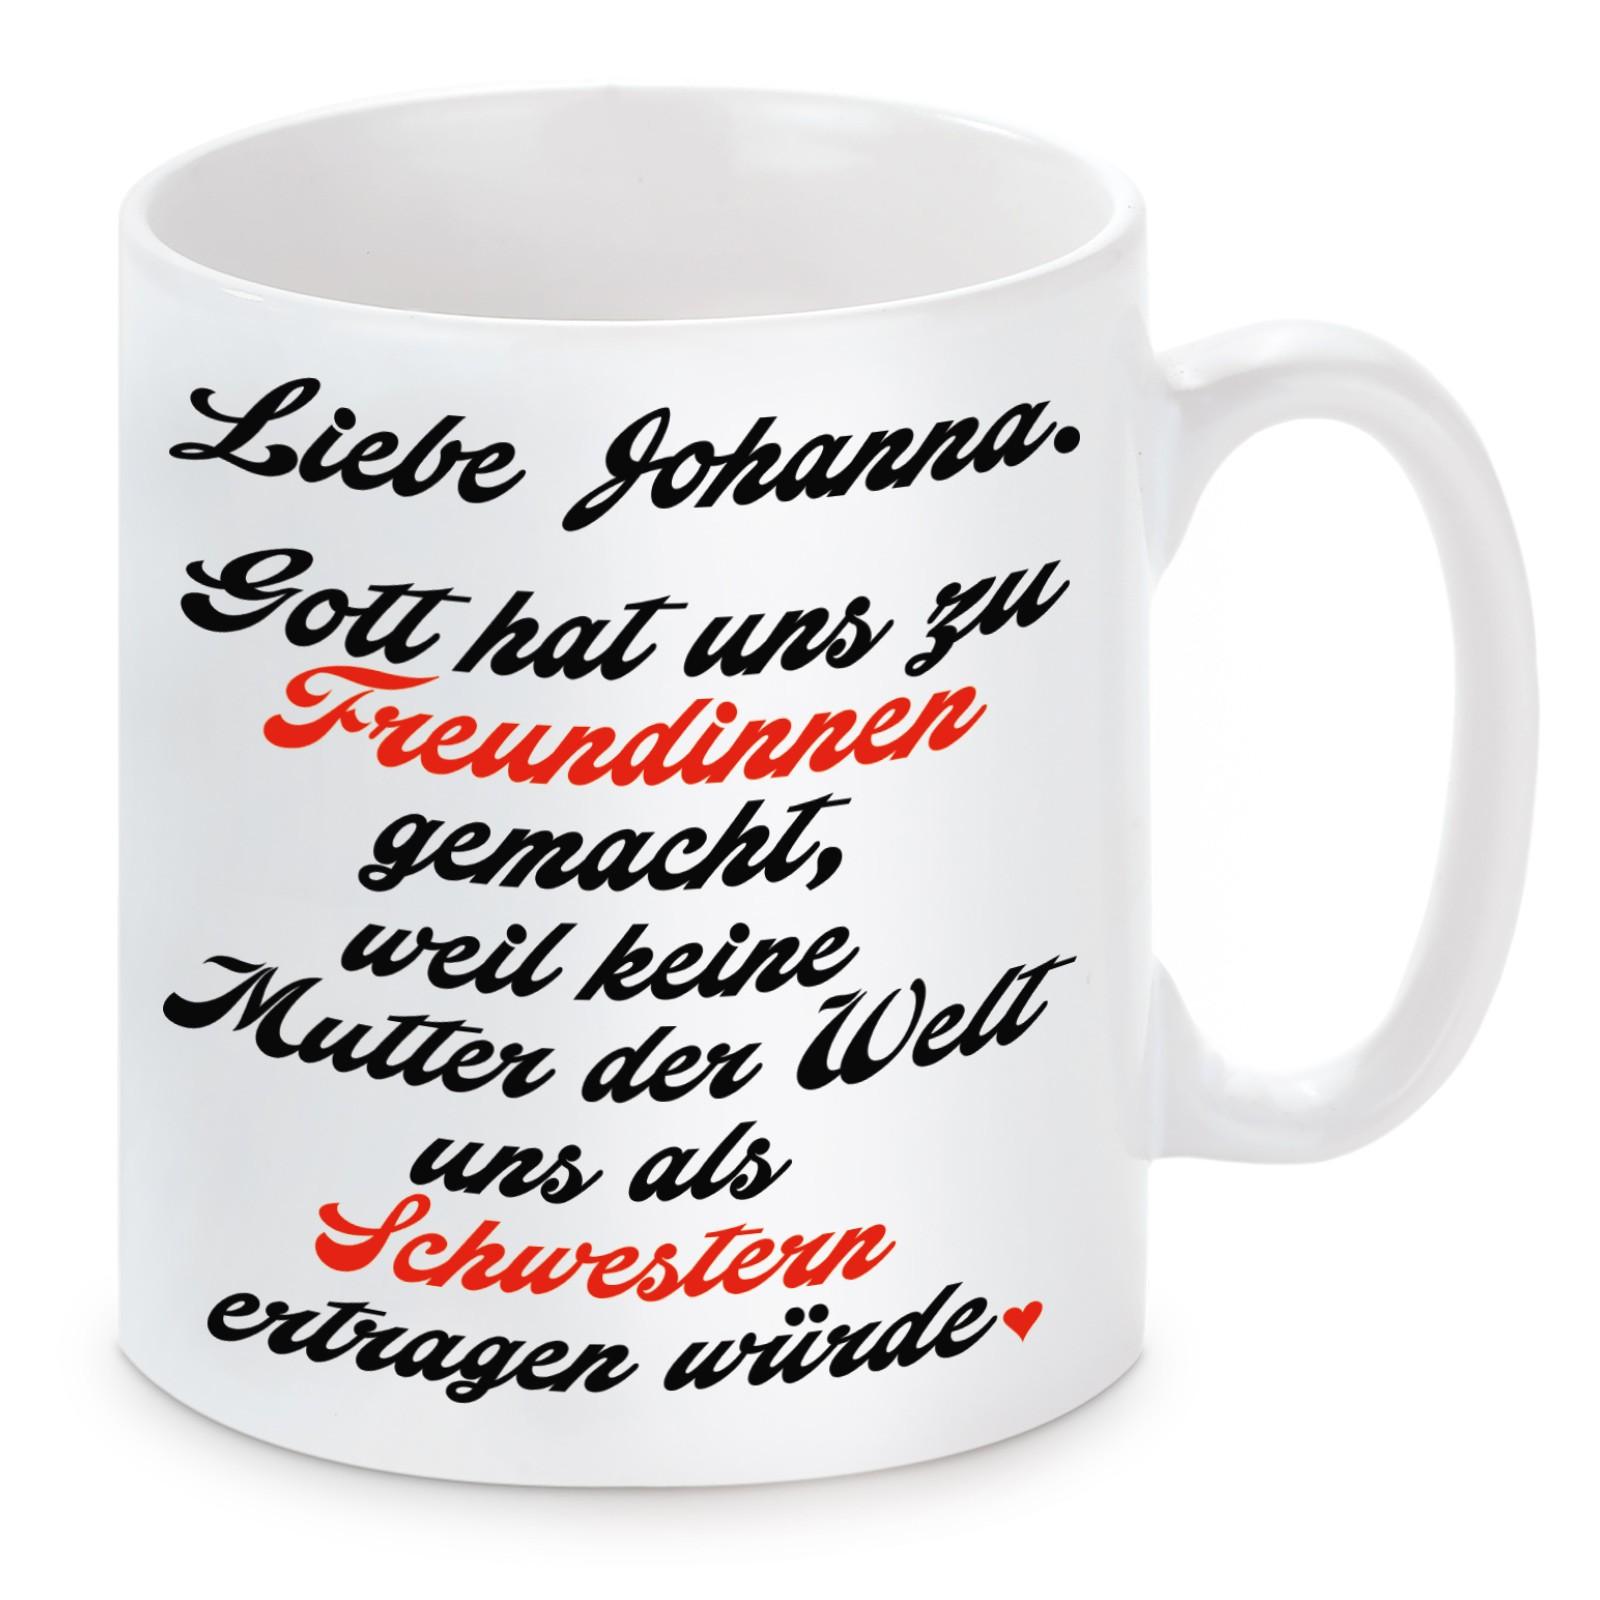 Tasse personalisiert